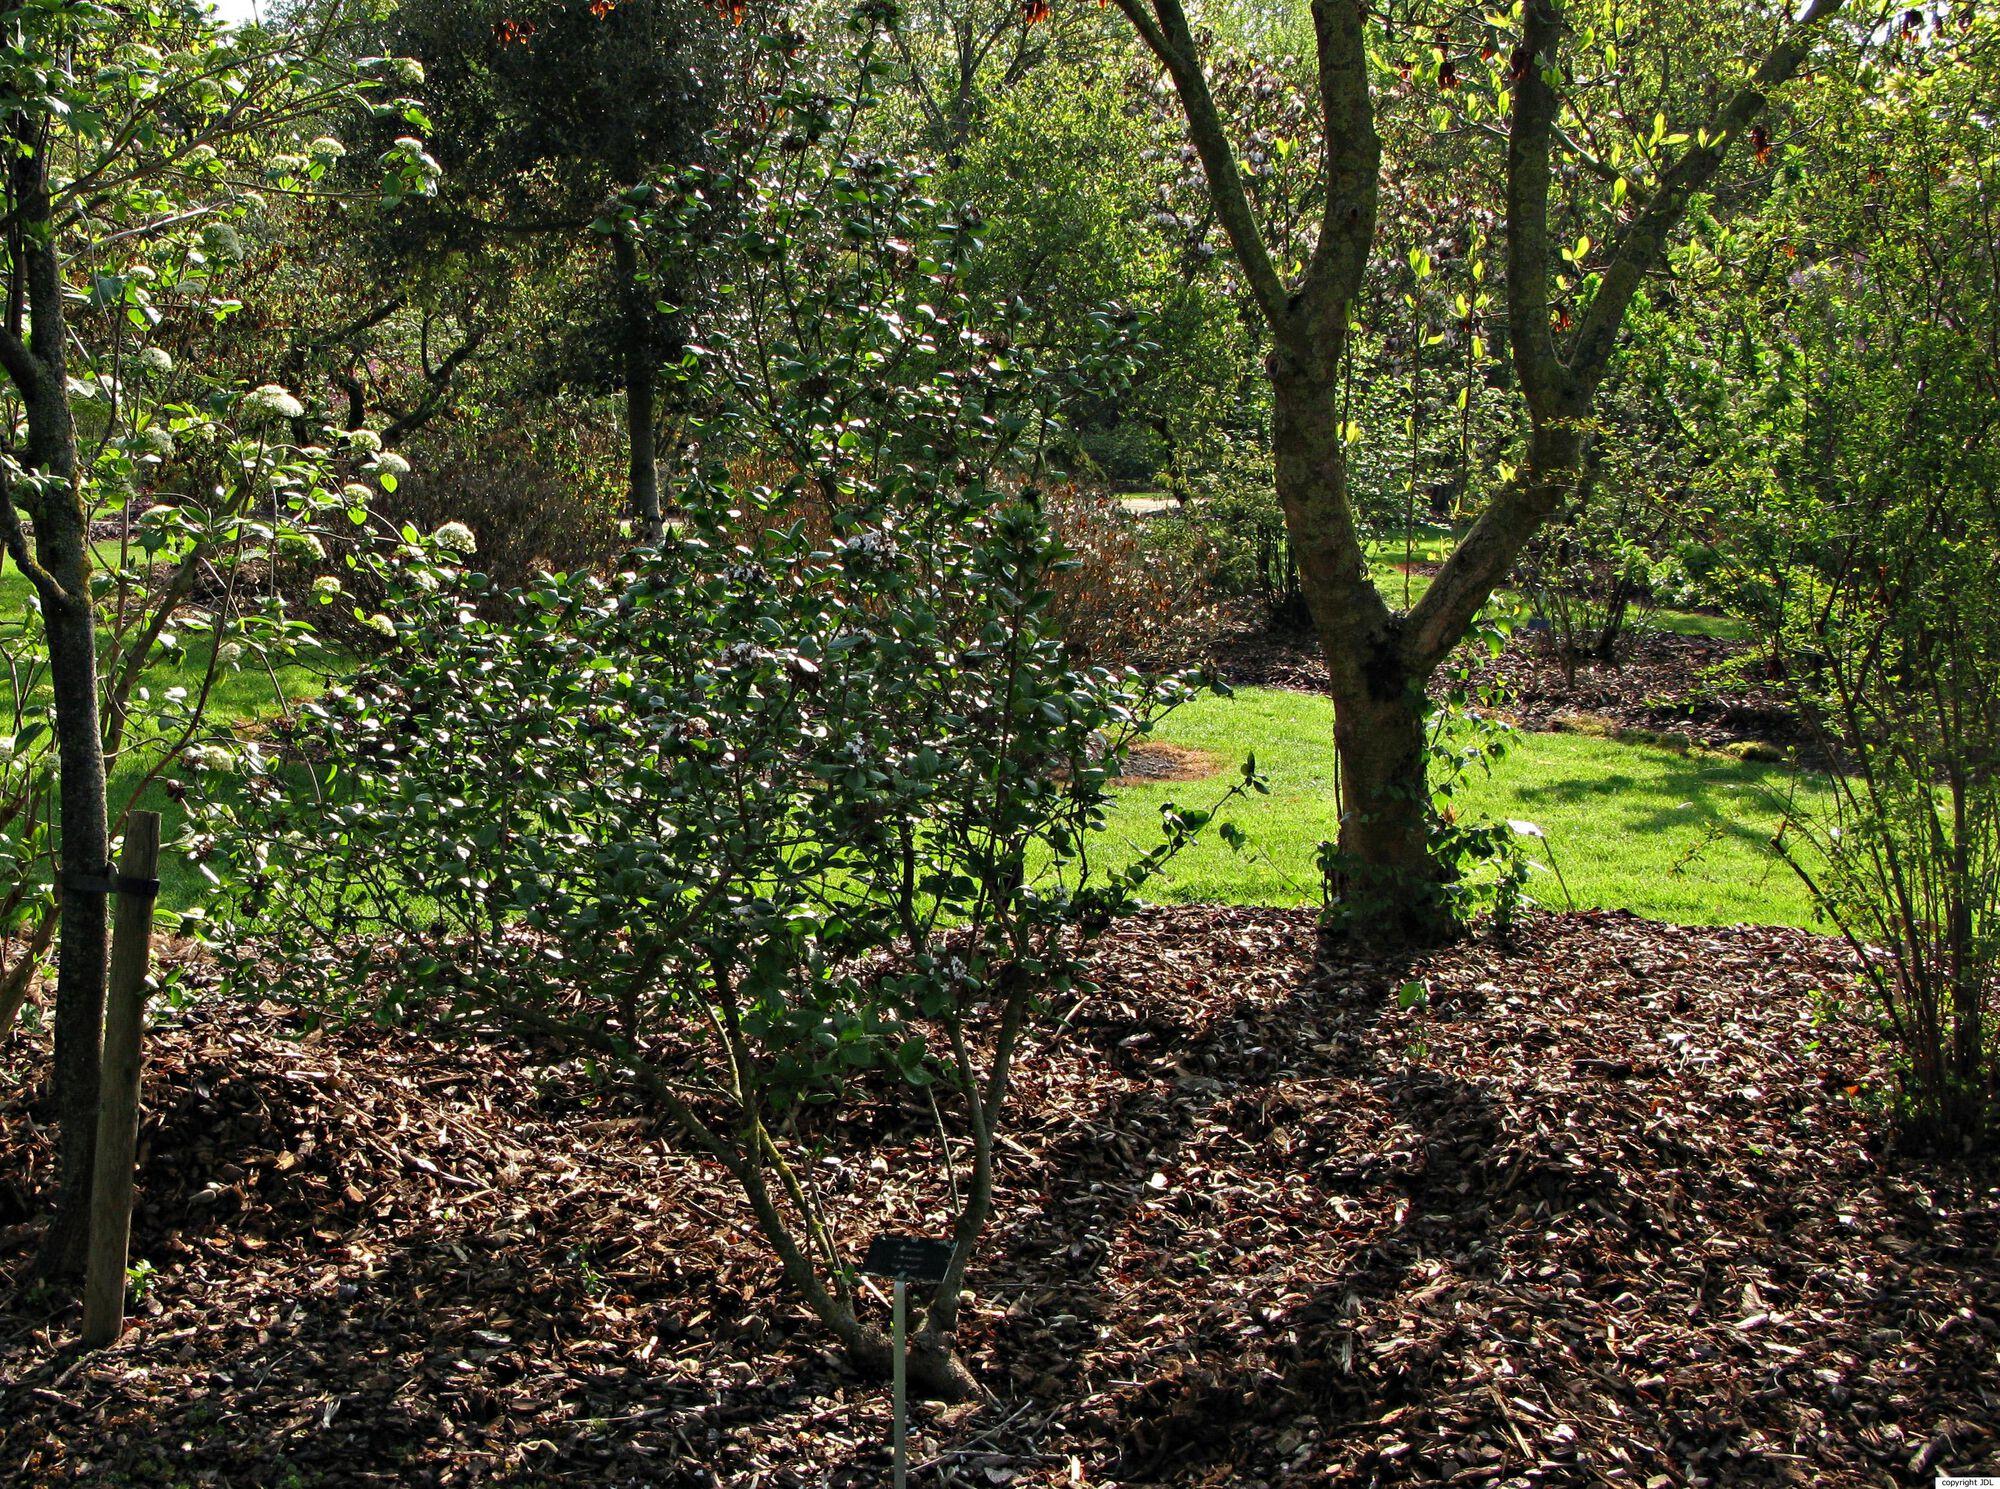 Viburnum ×burkwoodii Burkw. & Skipw. 'Anne Russell' (V. carlesii × (V. carlesii × V. utile))